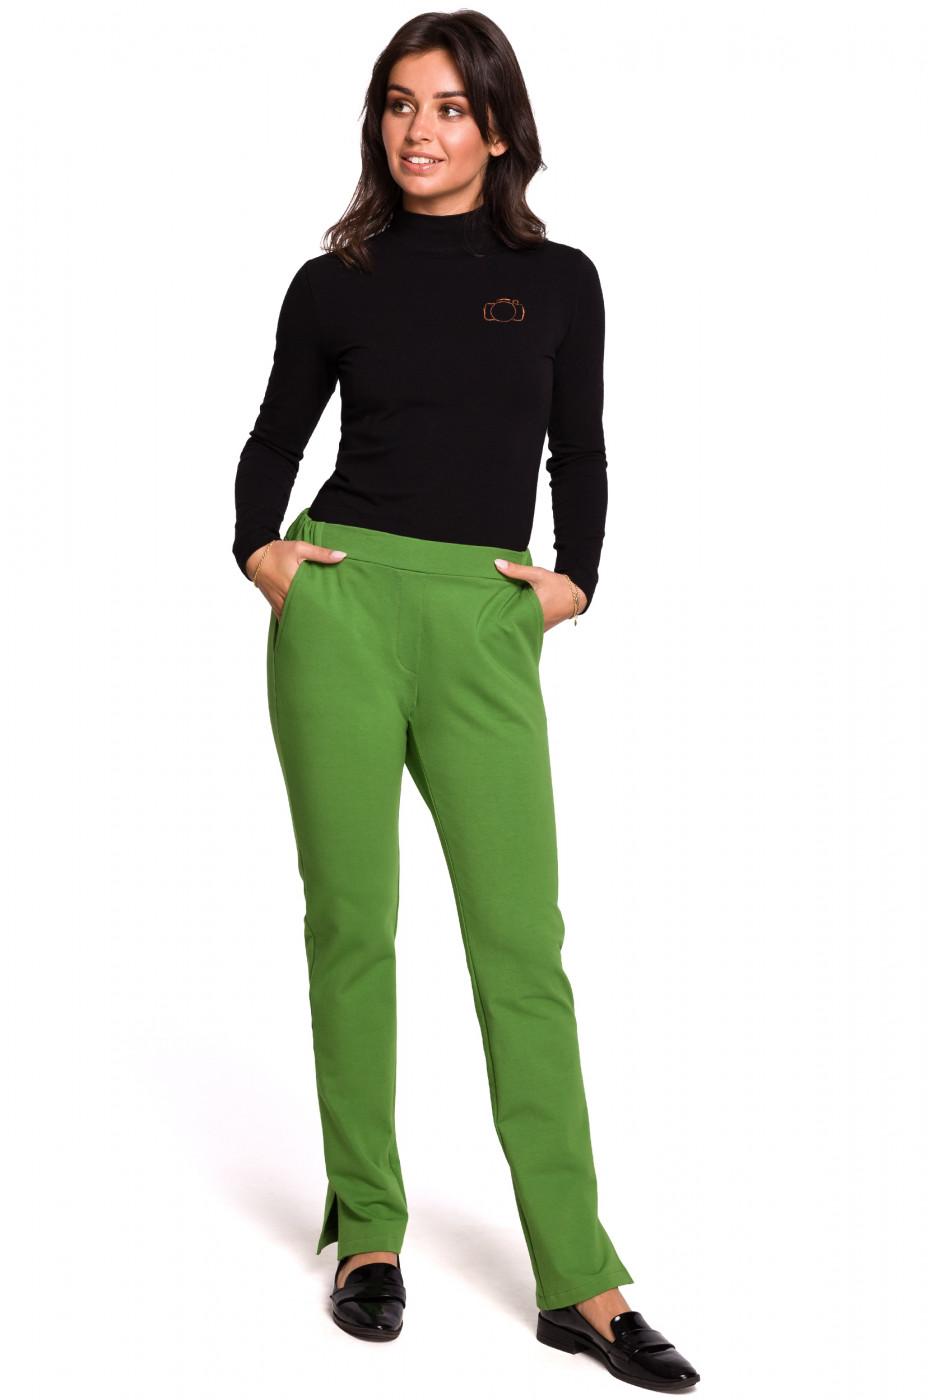 BeWear Woman's Trousers B124 Lime